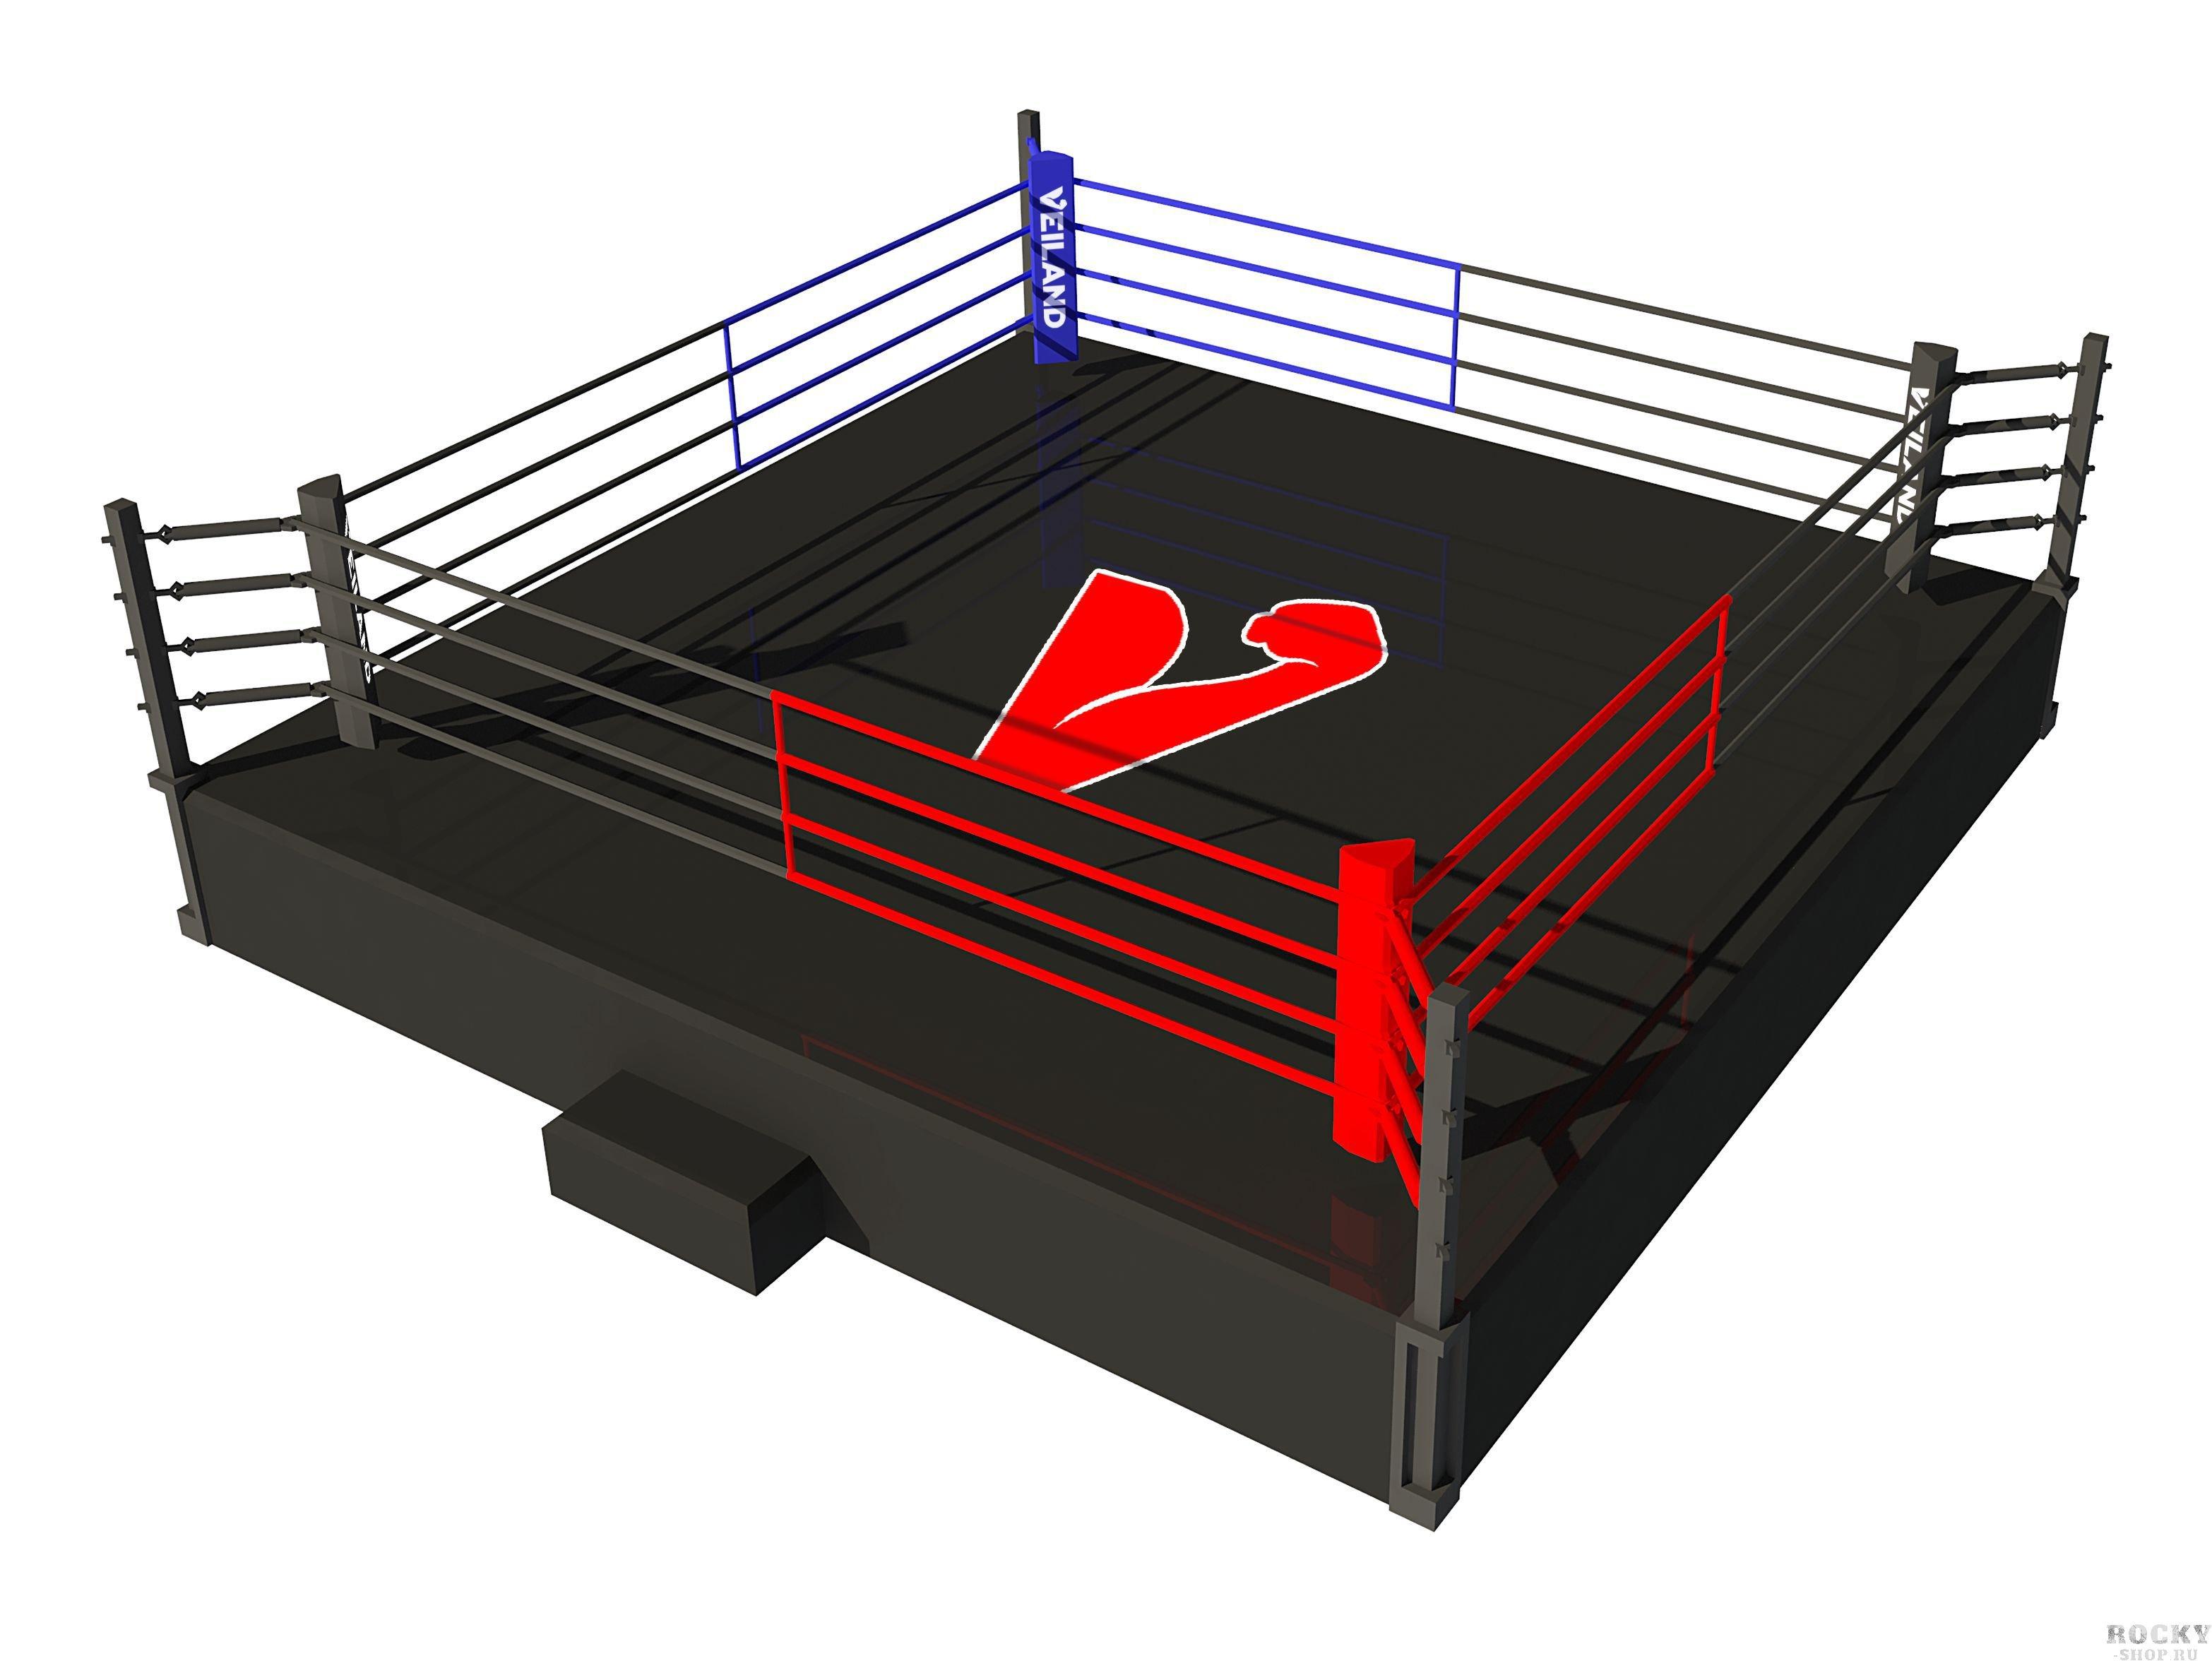 Боксерский ринг Veiland на помосте 1 метр, боевая зона 4х4 м Veiland